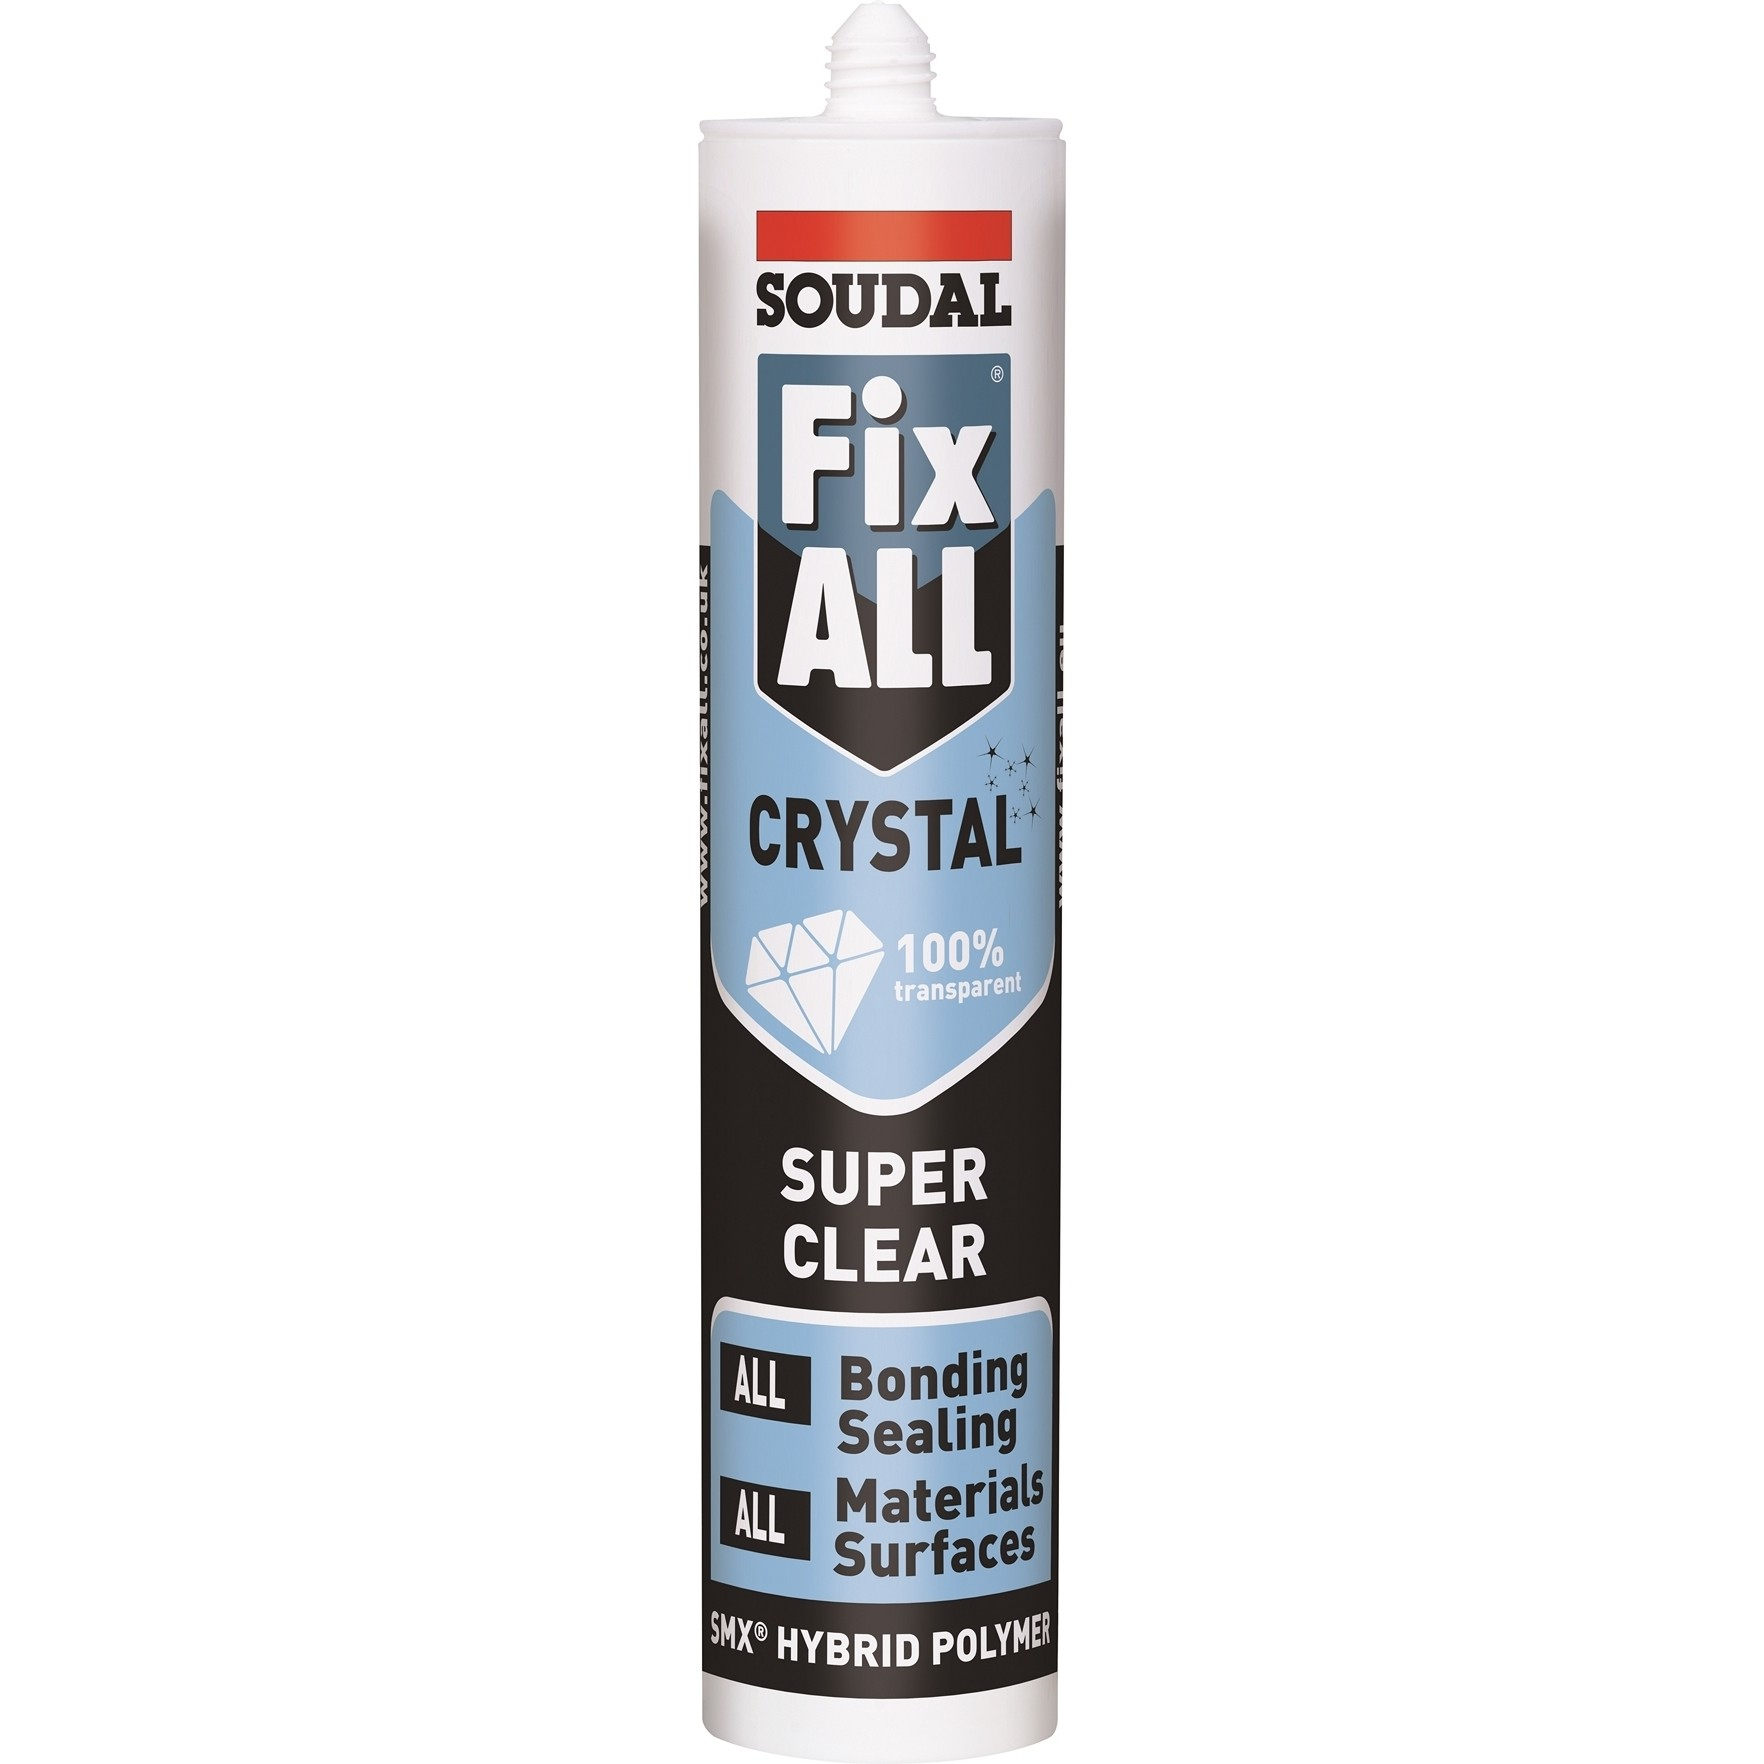 Soudal Fix All Crystal Trans MS Polymer 290ml